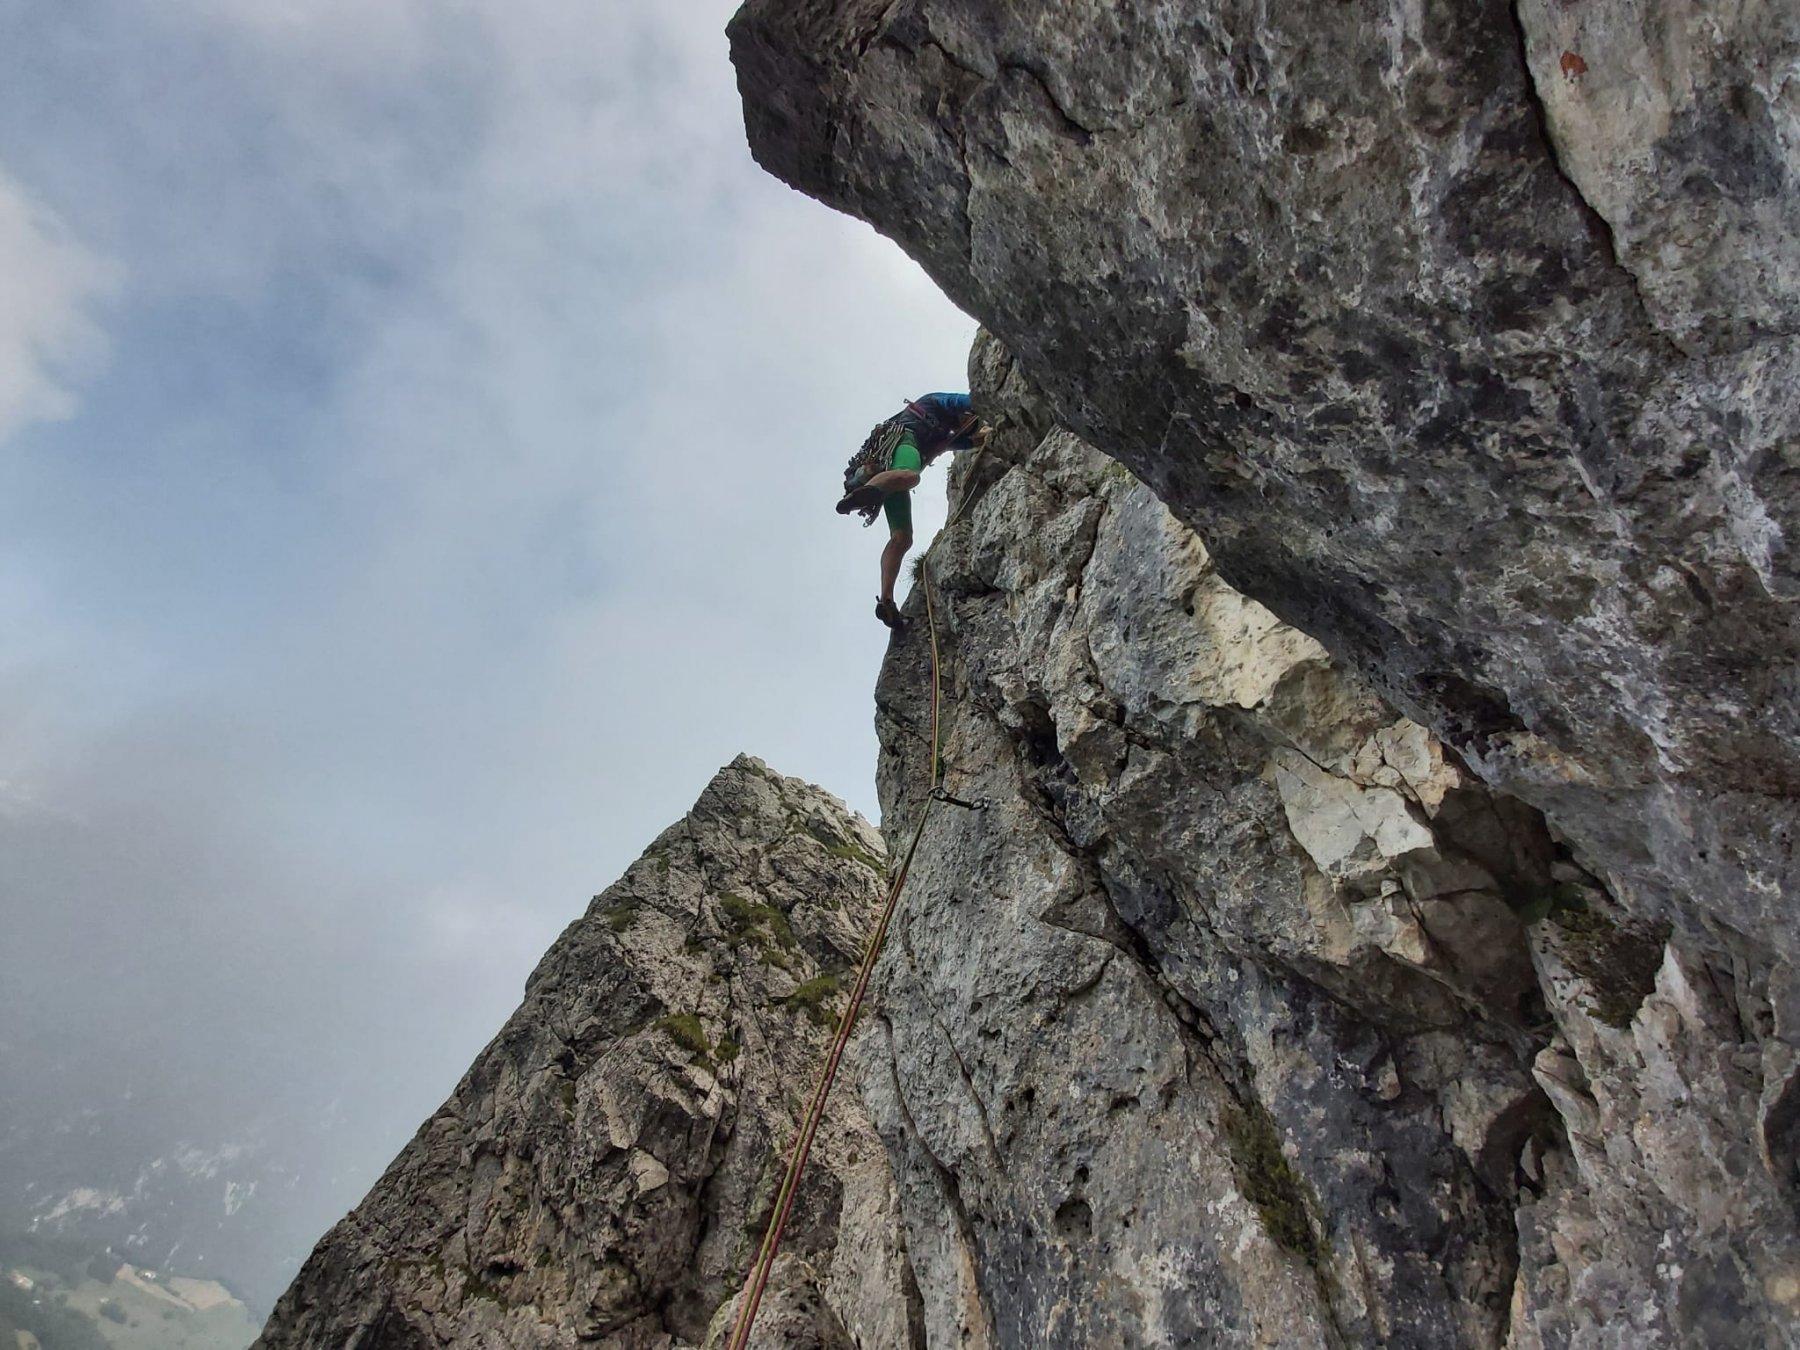 Croce Alben (Monte) - Punta Giulia Goccia diRugiada 2020-07-10